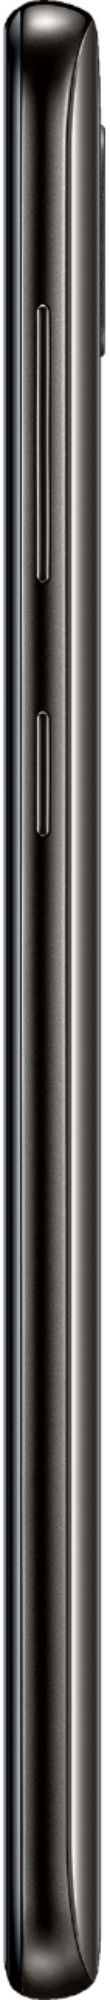 Samsung Galaxy A20 DS (SM-A205) 355710104206086 - 3